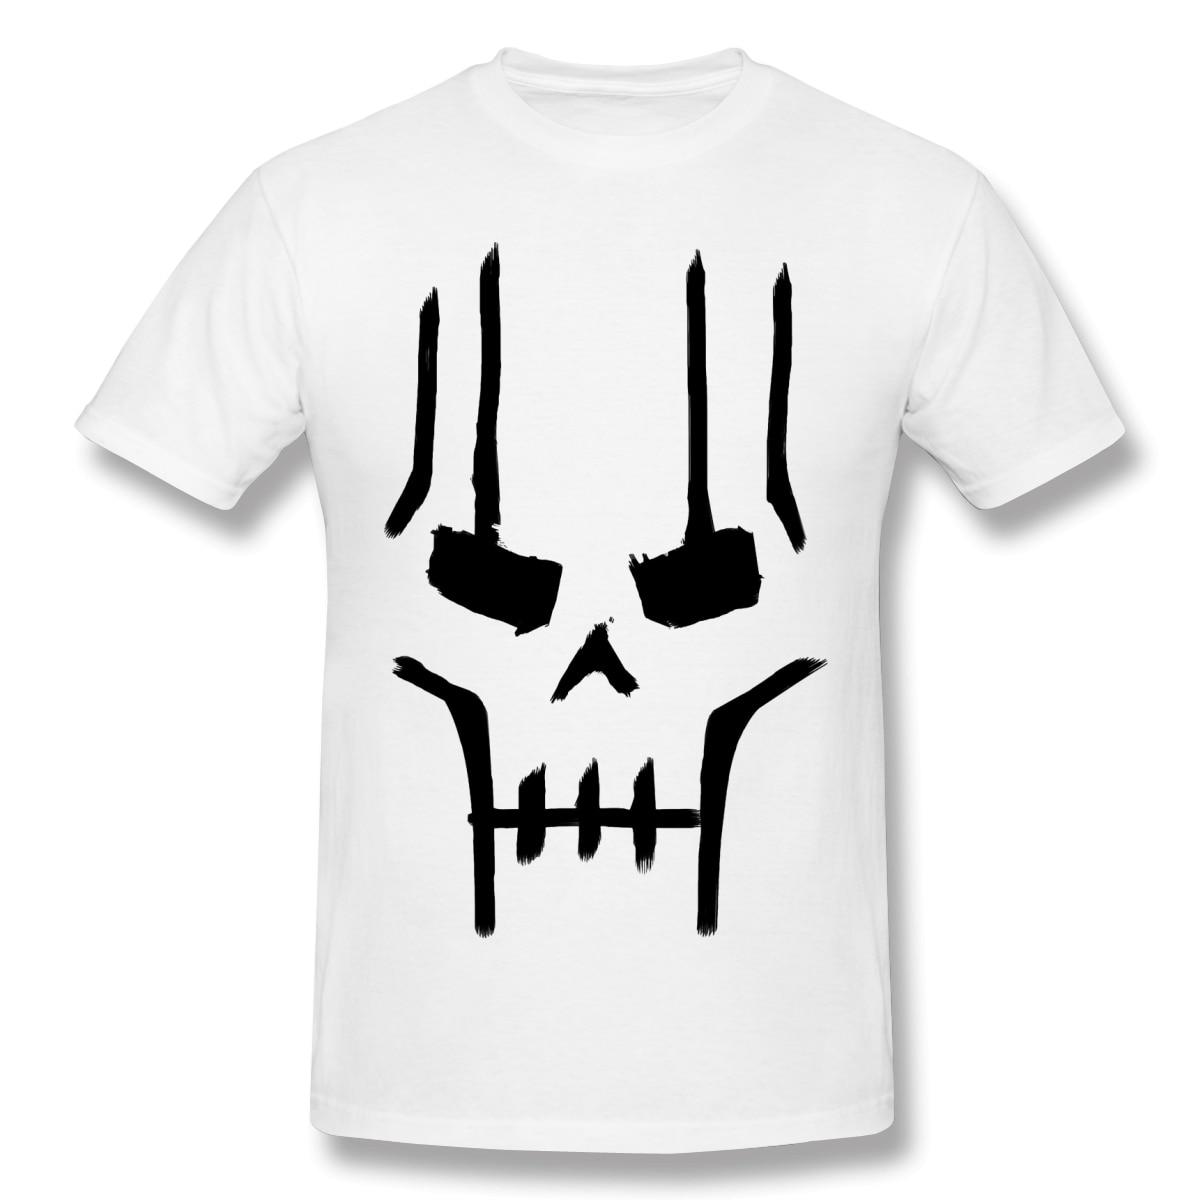 Camiseta de cuello redondo, diseño divertido, warhammer, juegos, taller, ropa de calle, camiseta estampada para hombre